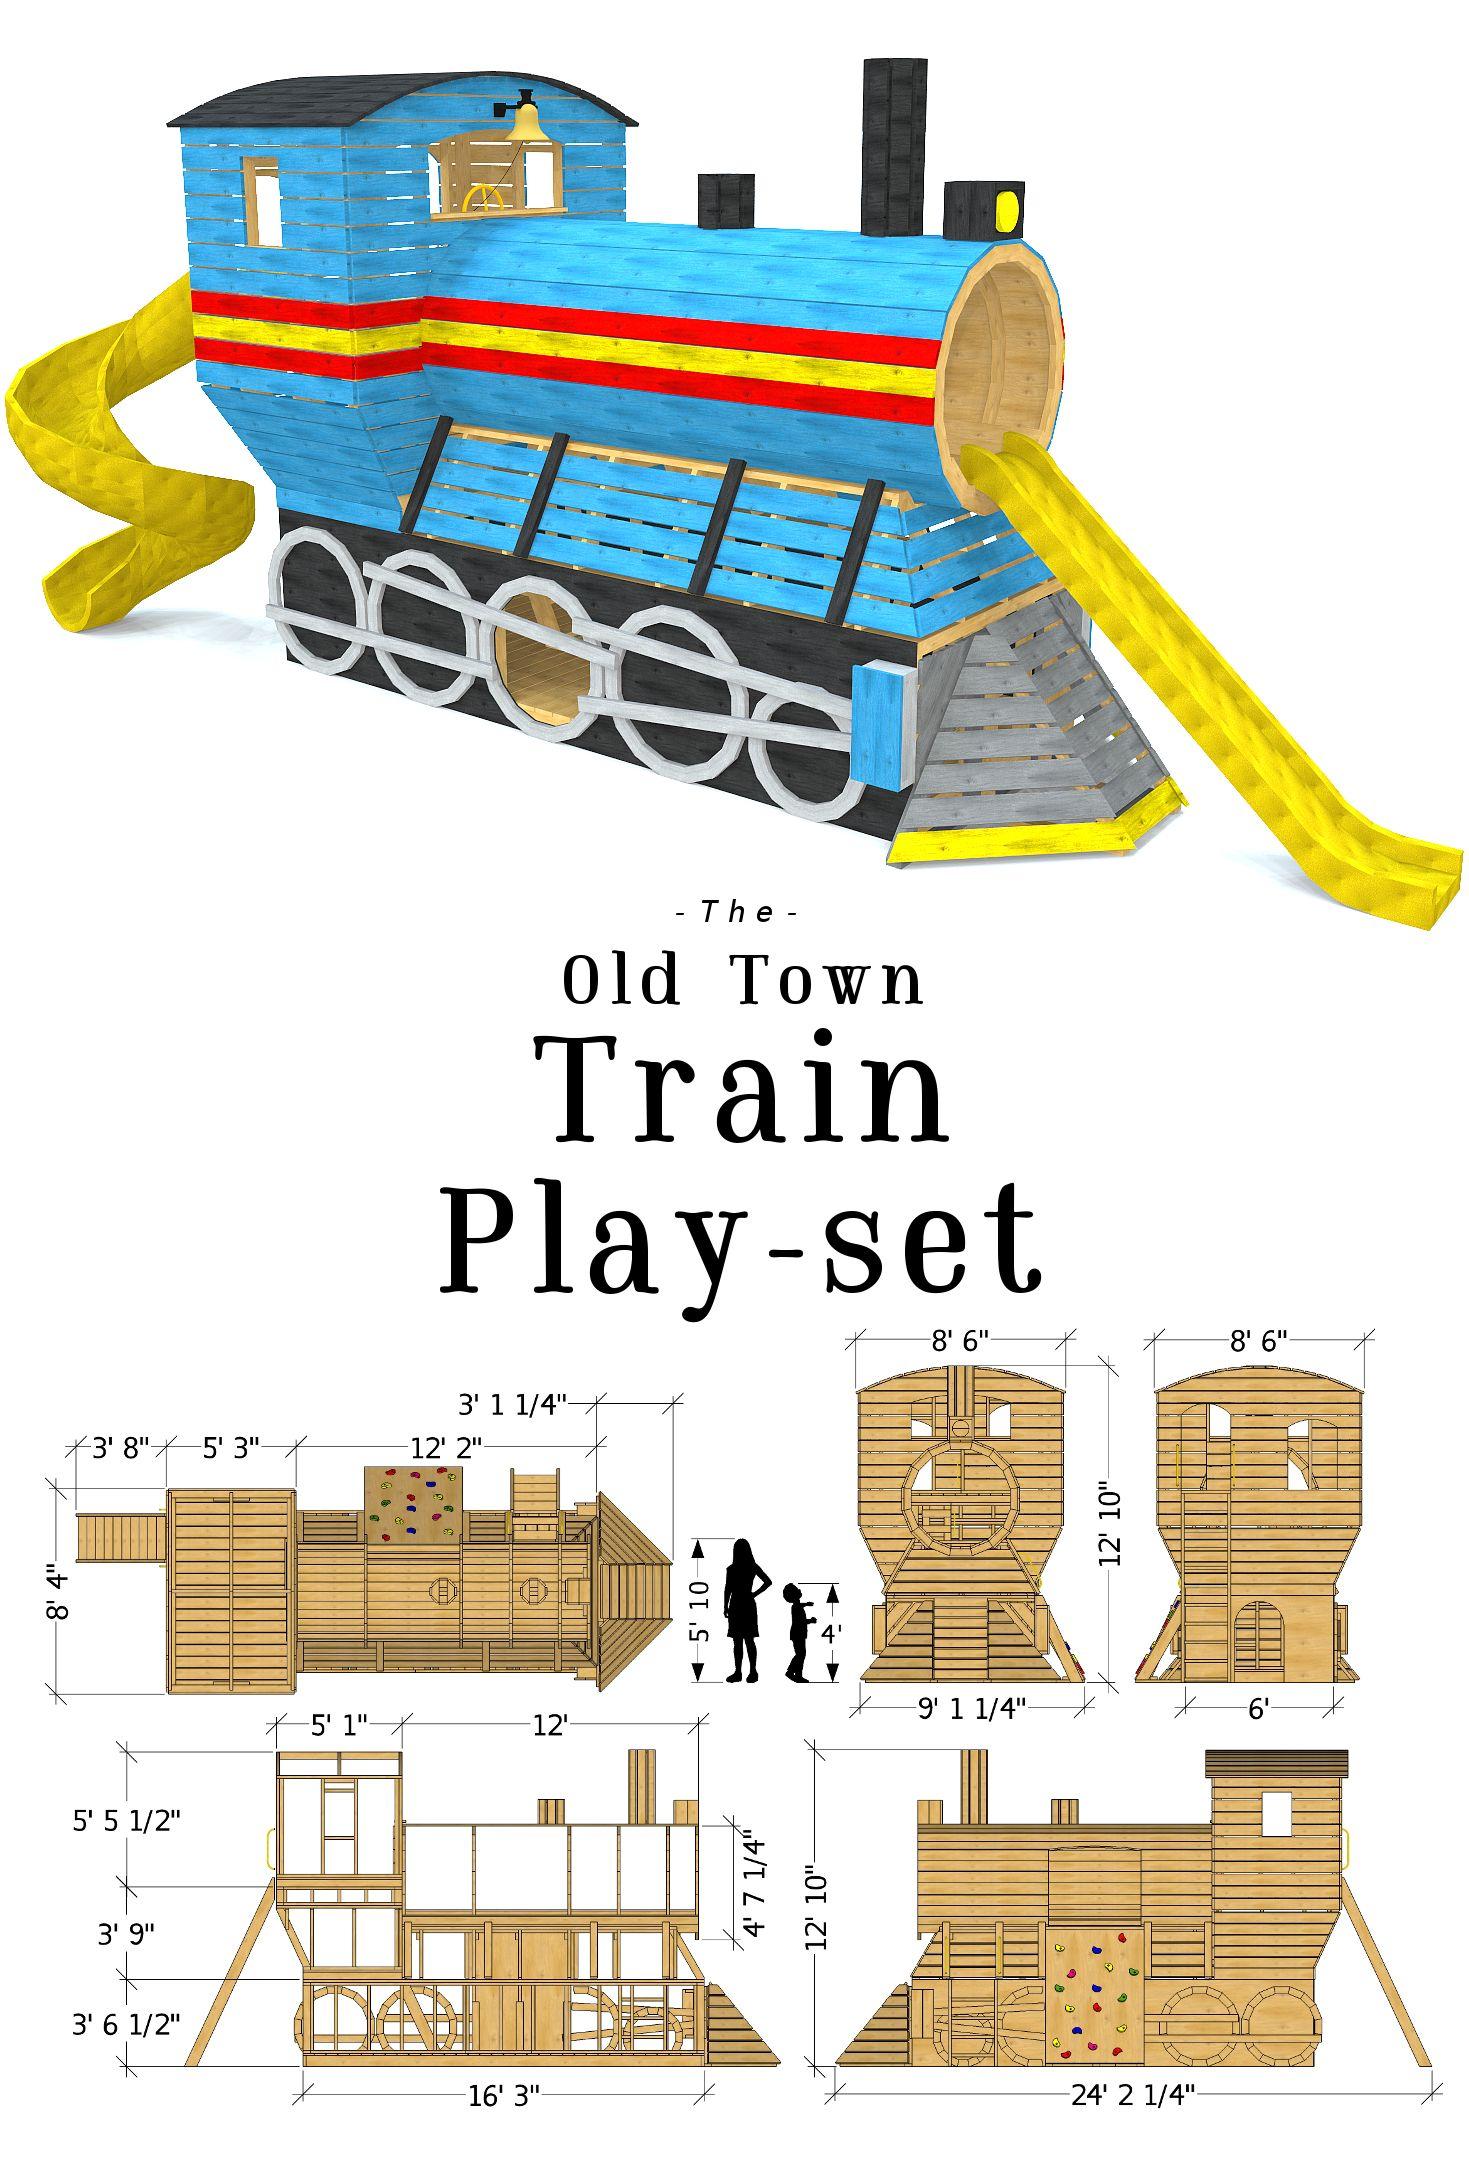 Old Town Train Playset Plan Playset Plans Backyard Playset Play Houses Diy backyard train plans